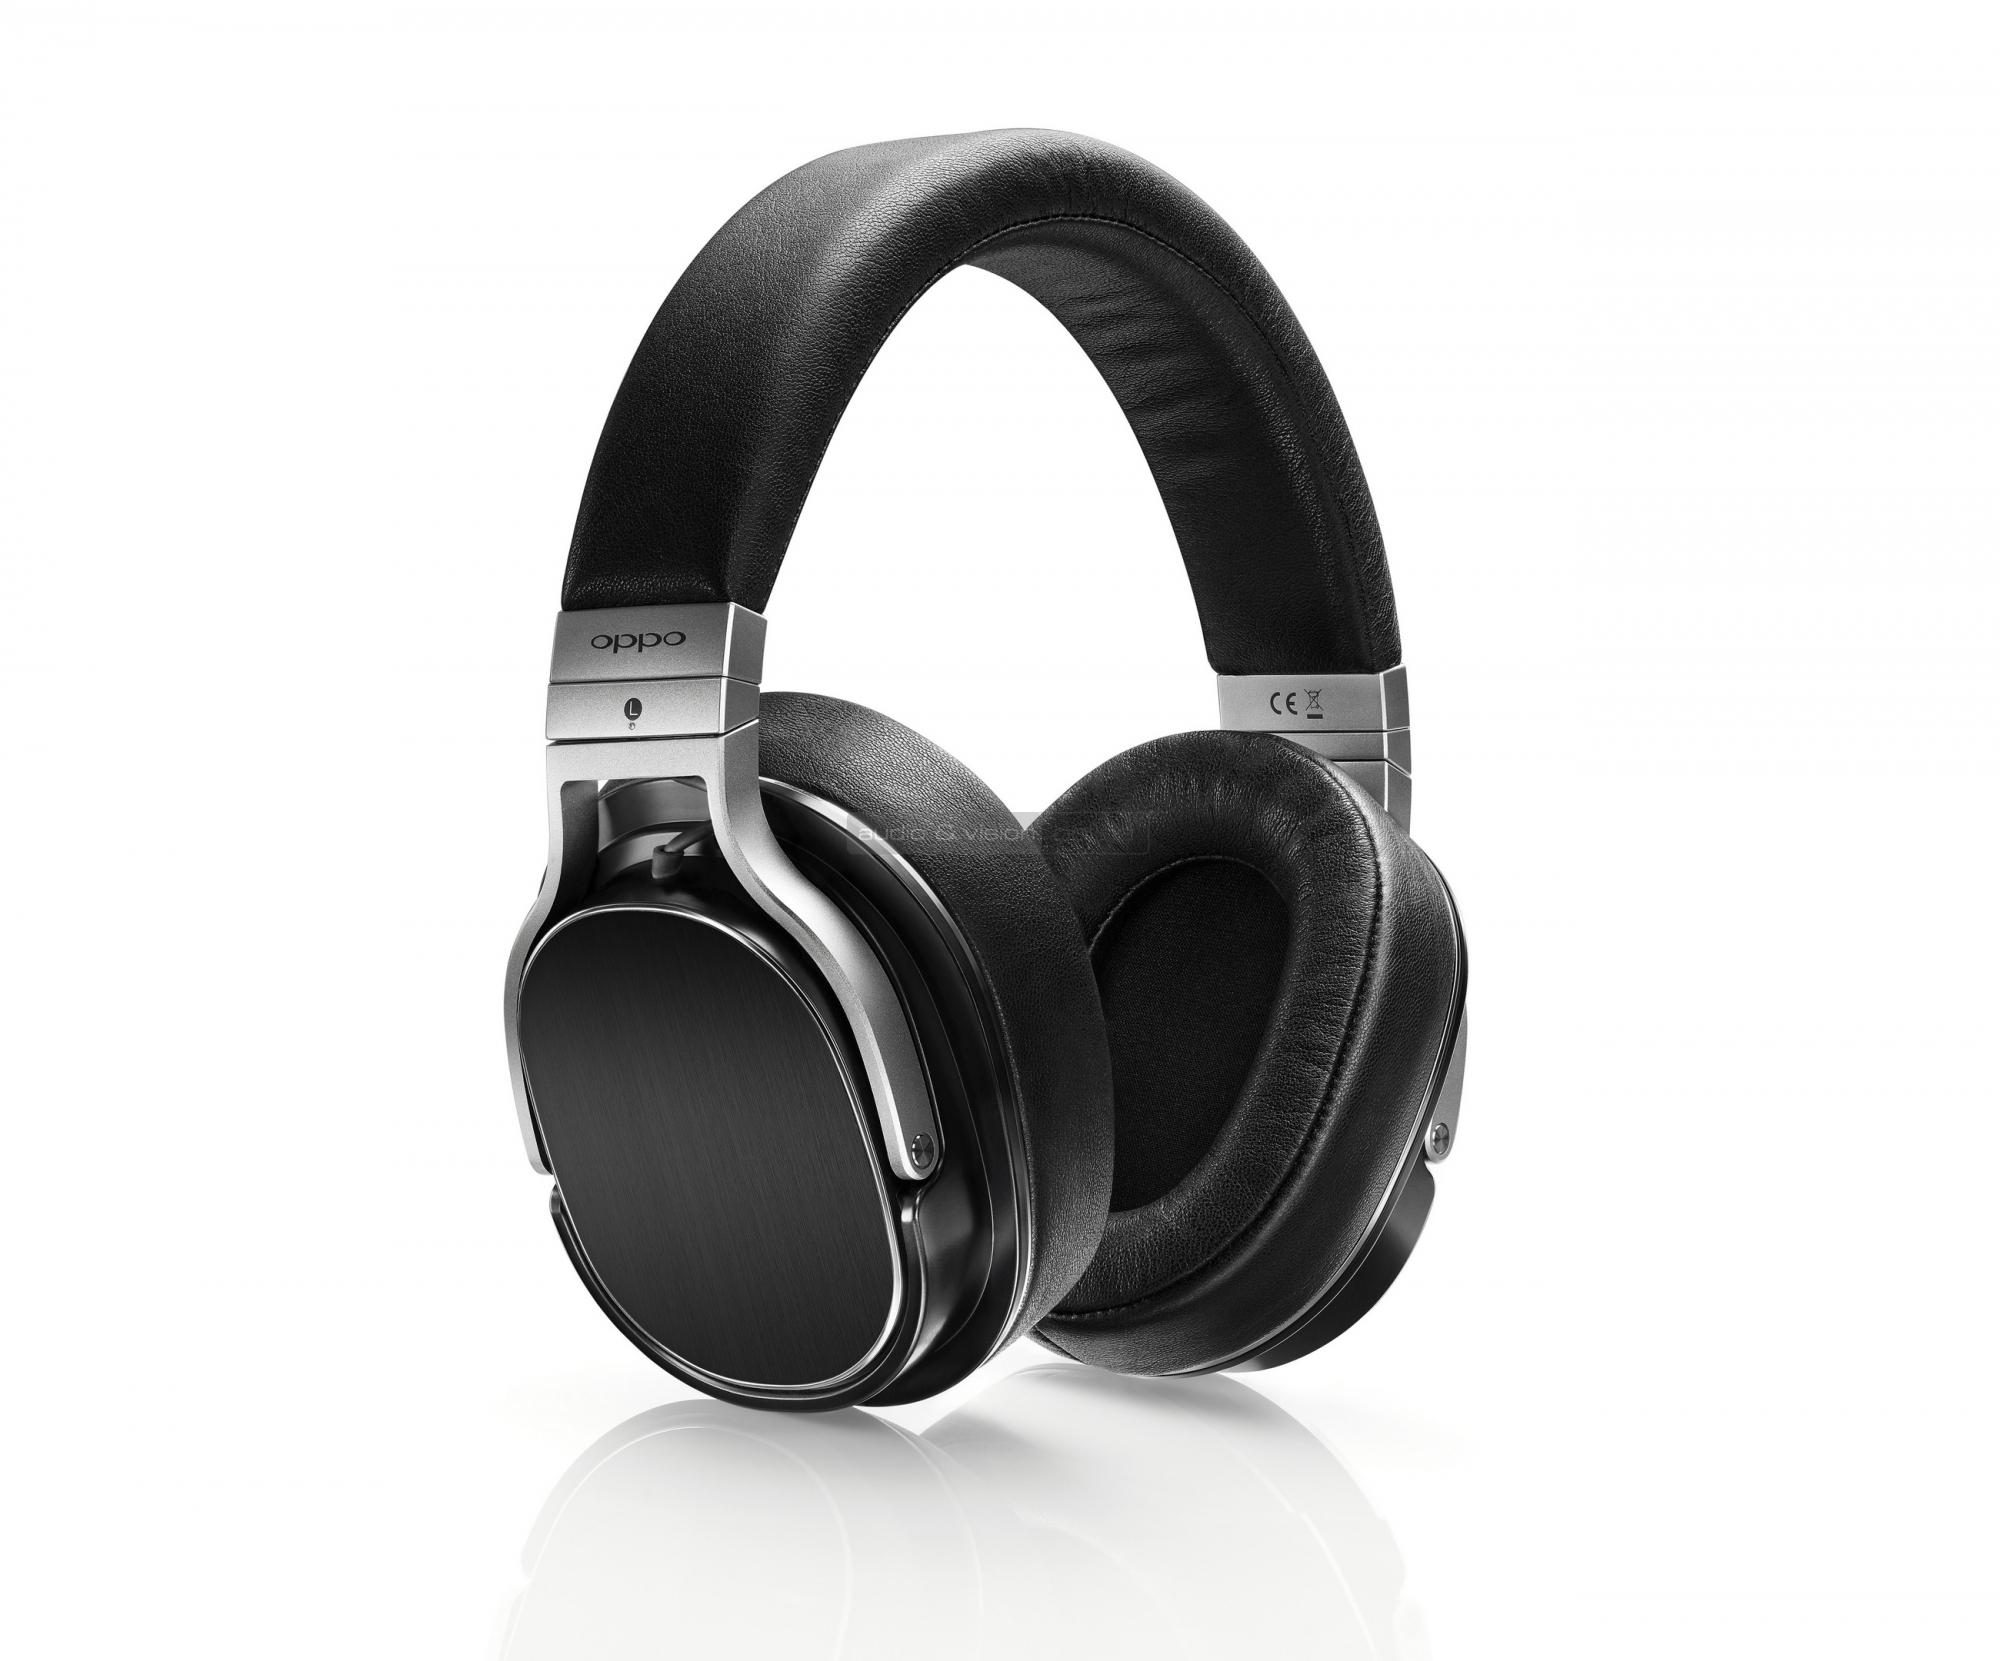 OPPO PM-3 mobil fejhallgató teszt  6763d3a4e8